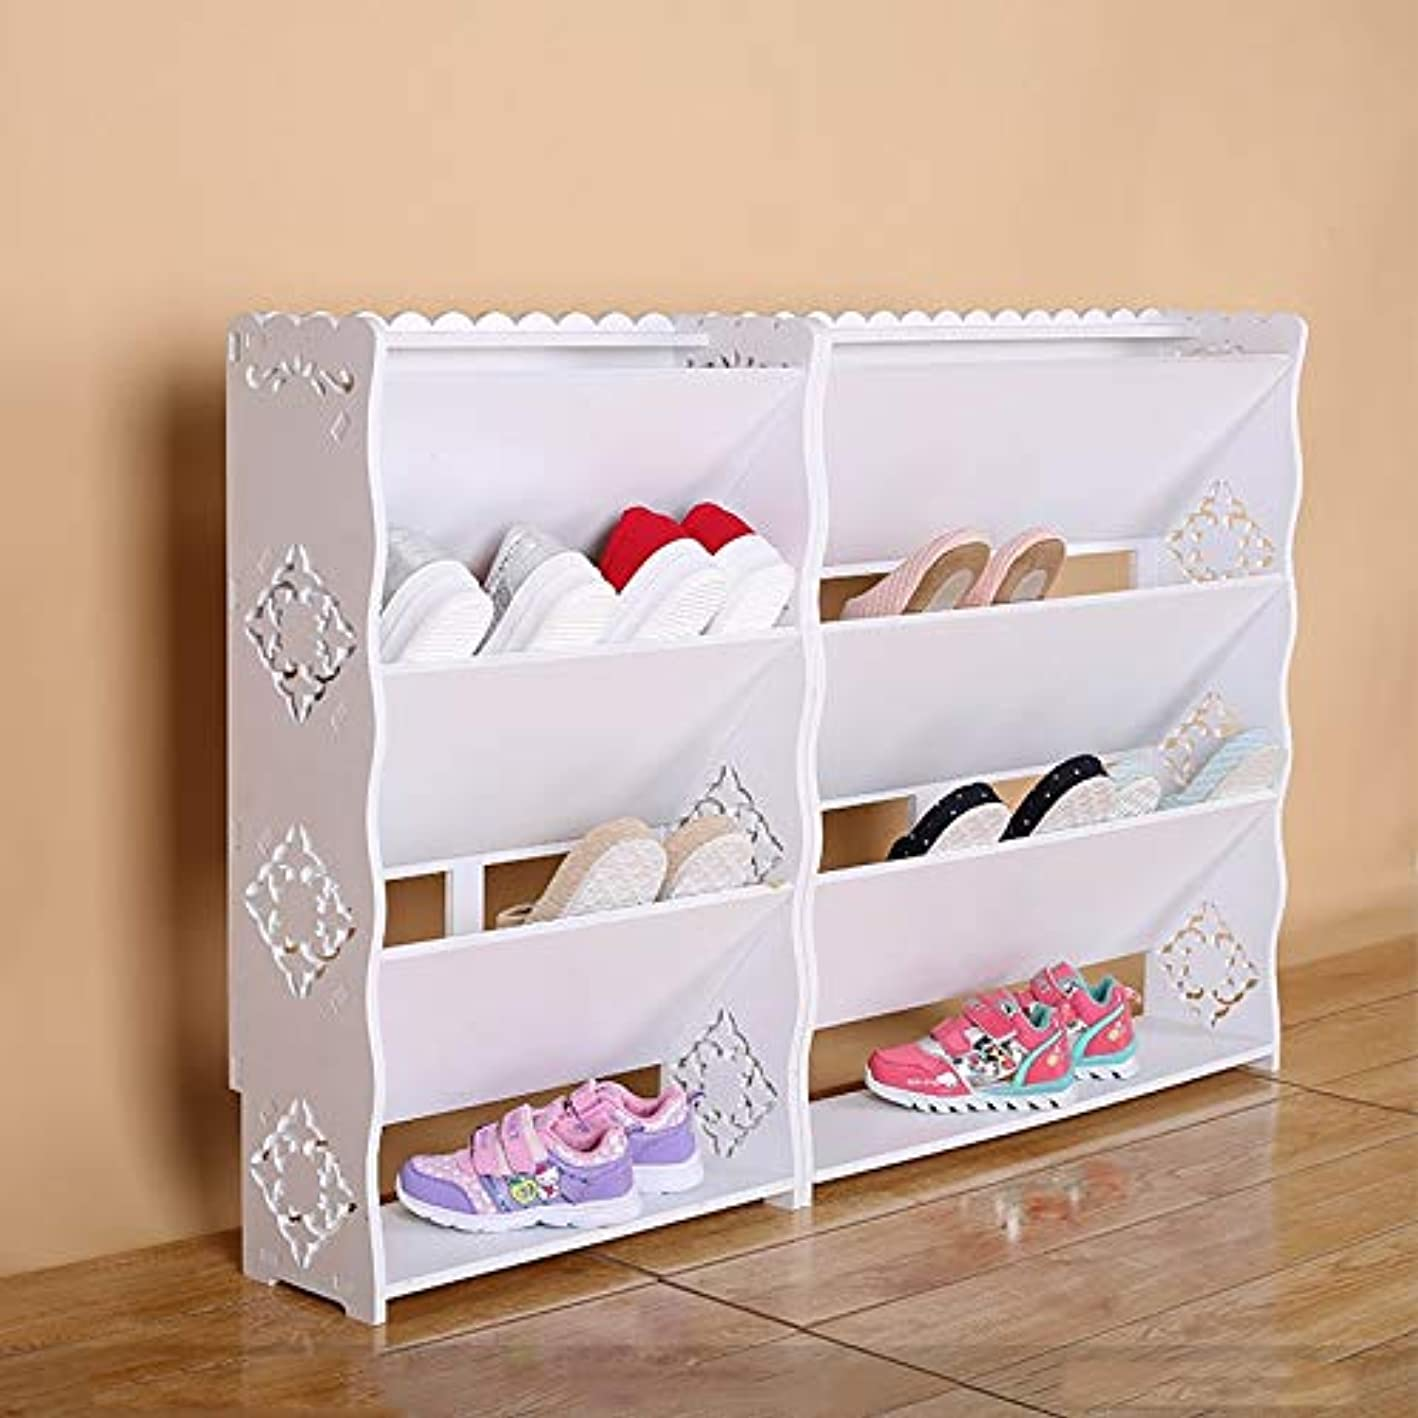 RMJAI Shoe Rack Shoe Organizer Storage Shelf Tilt White Bathroom Door Shoe Organizer (Color : B, Size : XL)